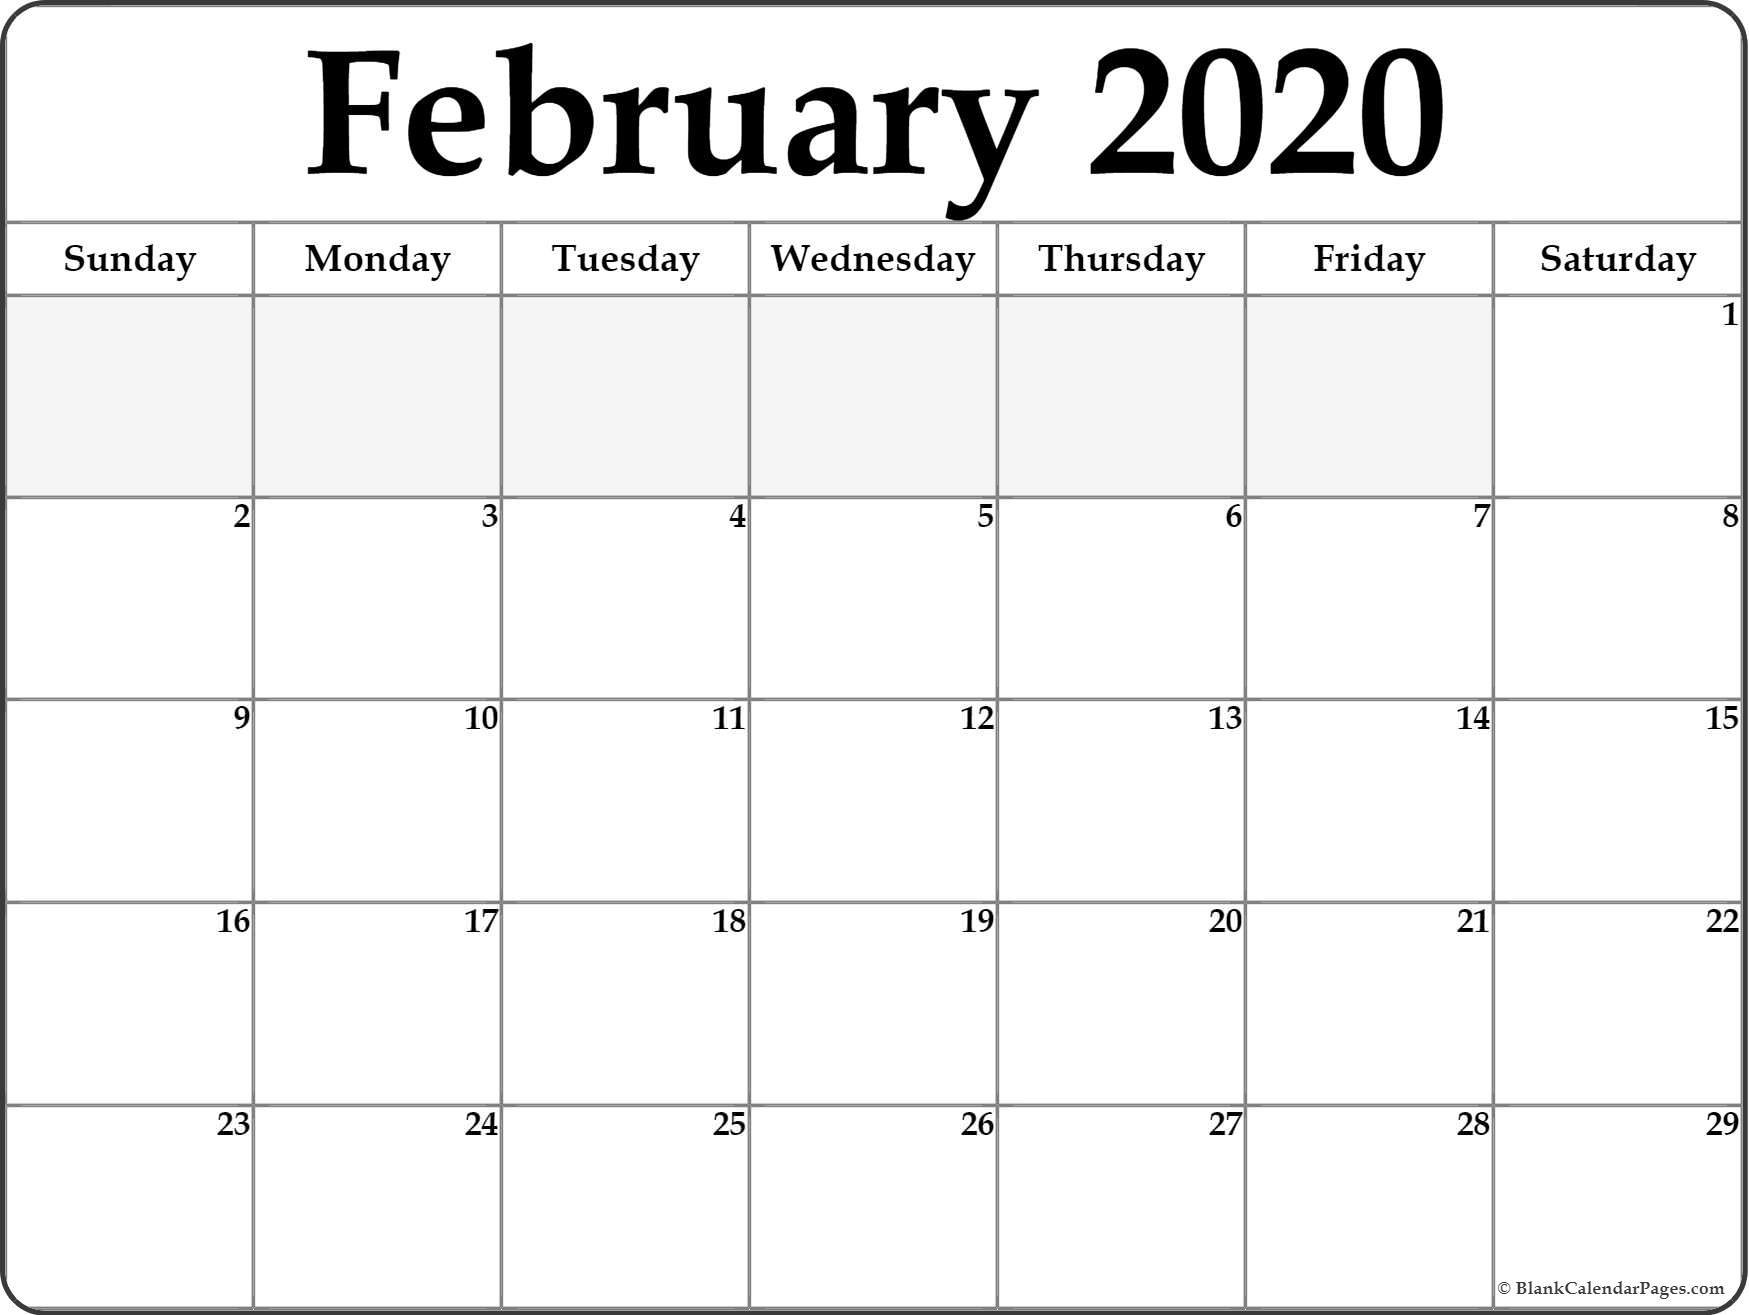 February 2020 Calendar | Free Printable Monthly Calendars-Blank Fill In Calendars 2020 Printable